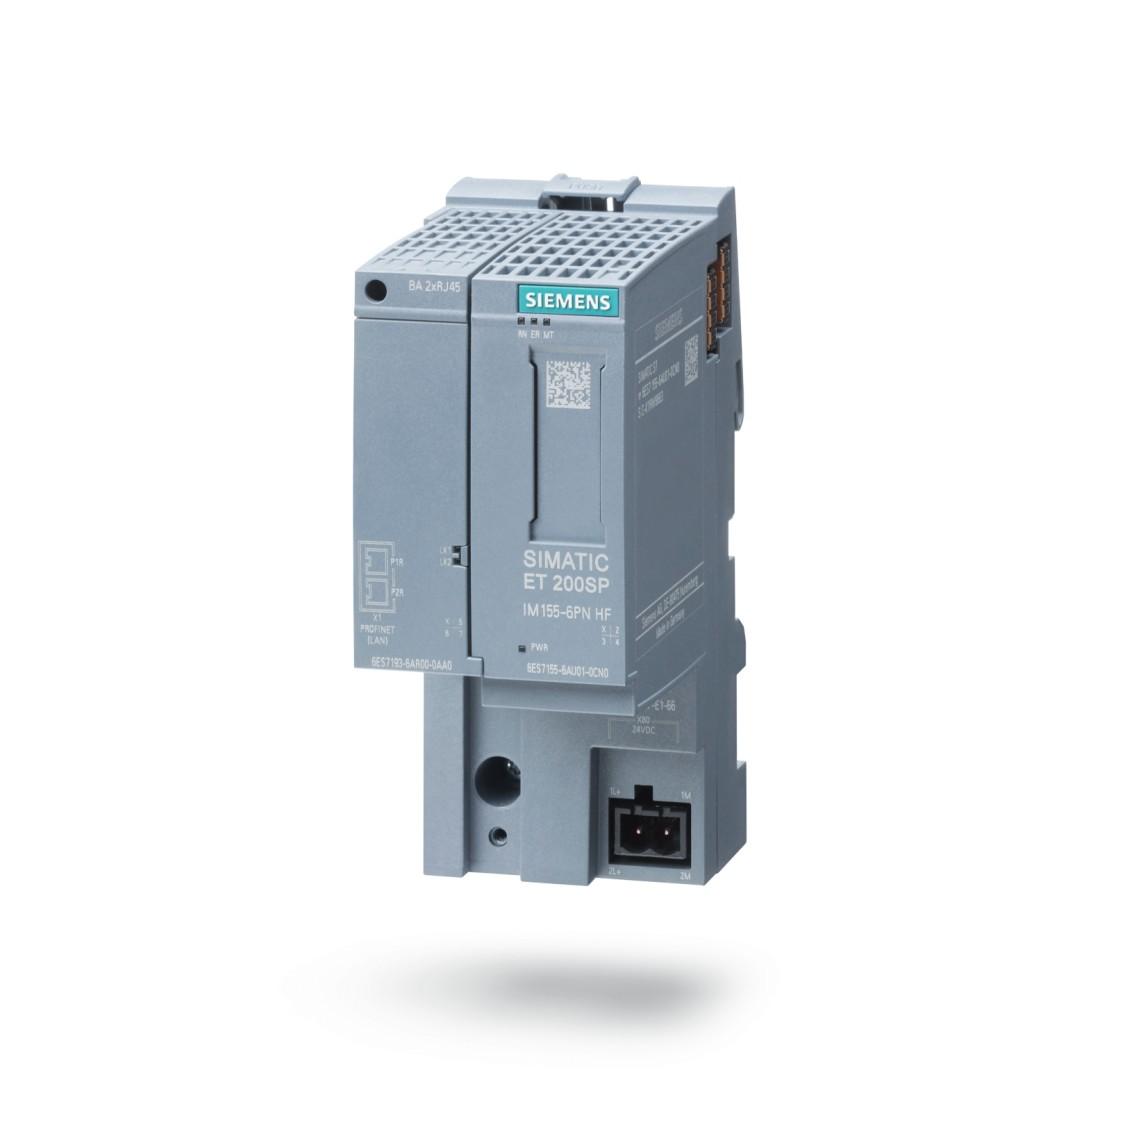 SIMATIC ET 200SP IM 155-6PN/2 HF with BA 2xRJ45